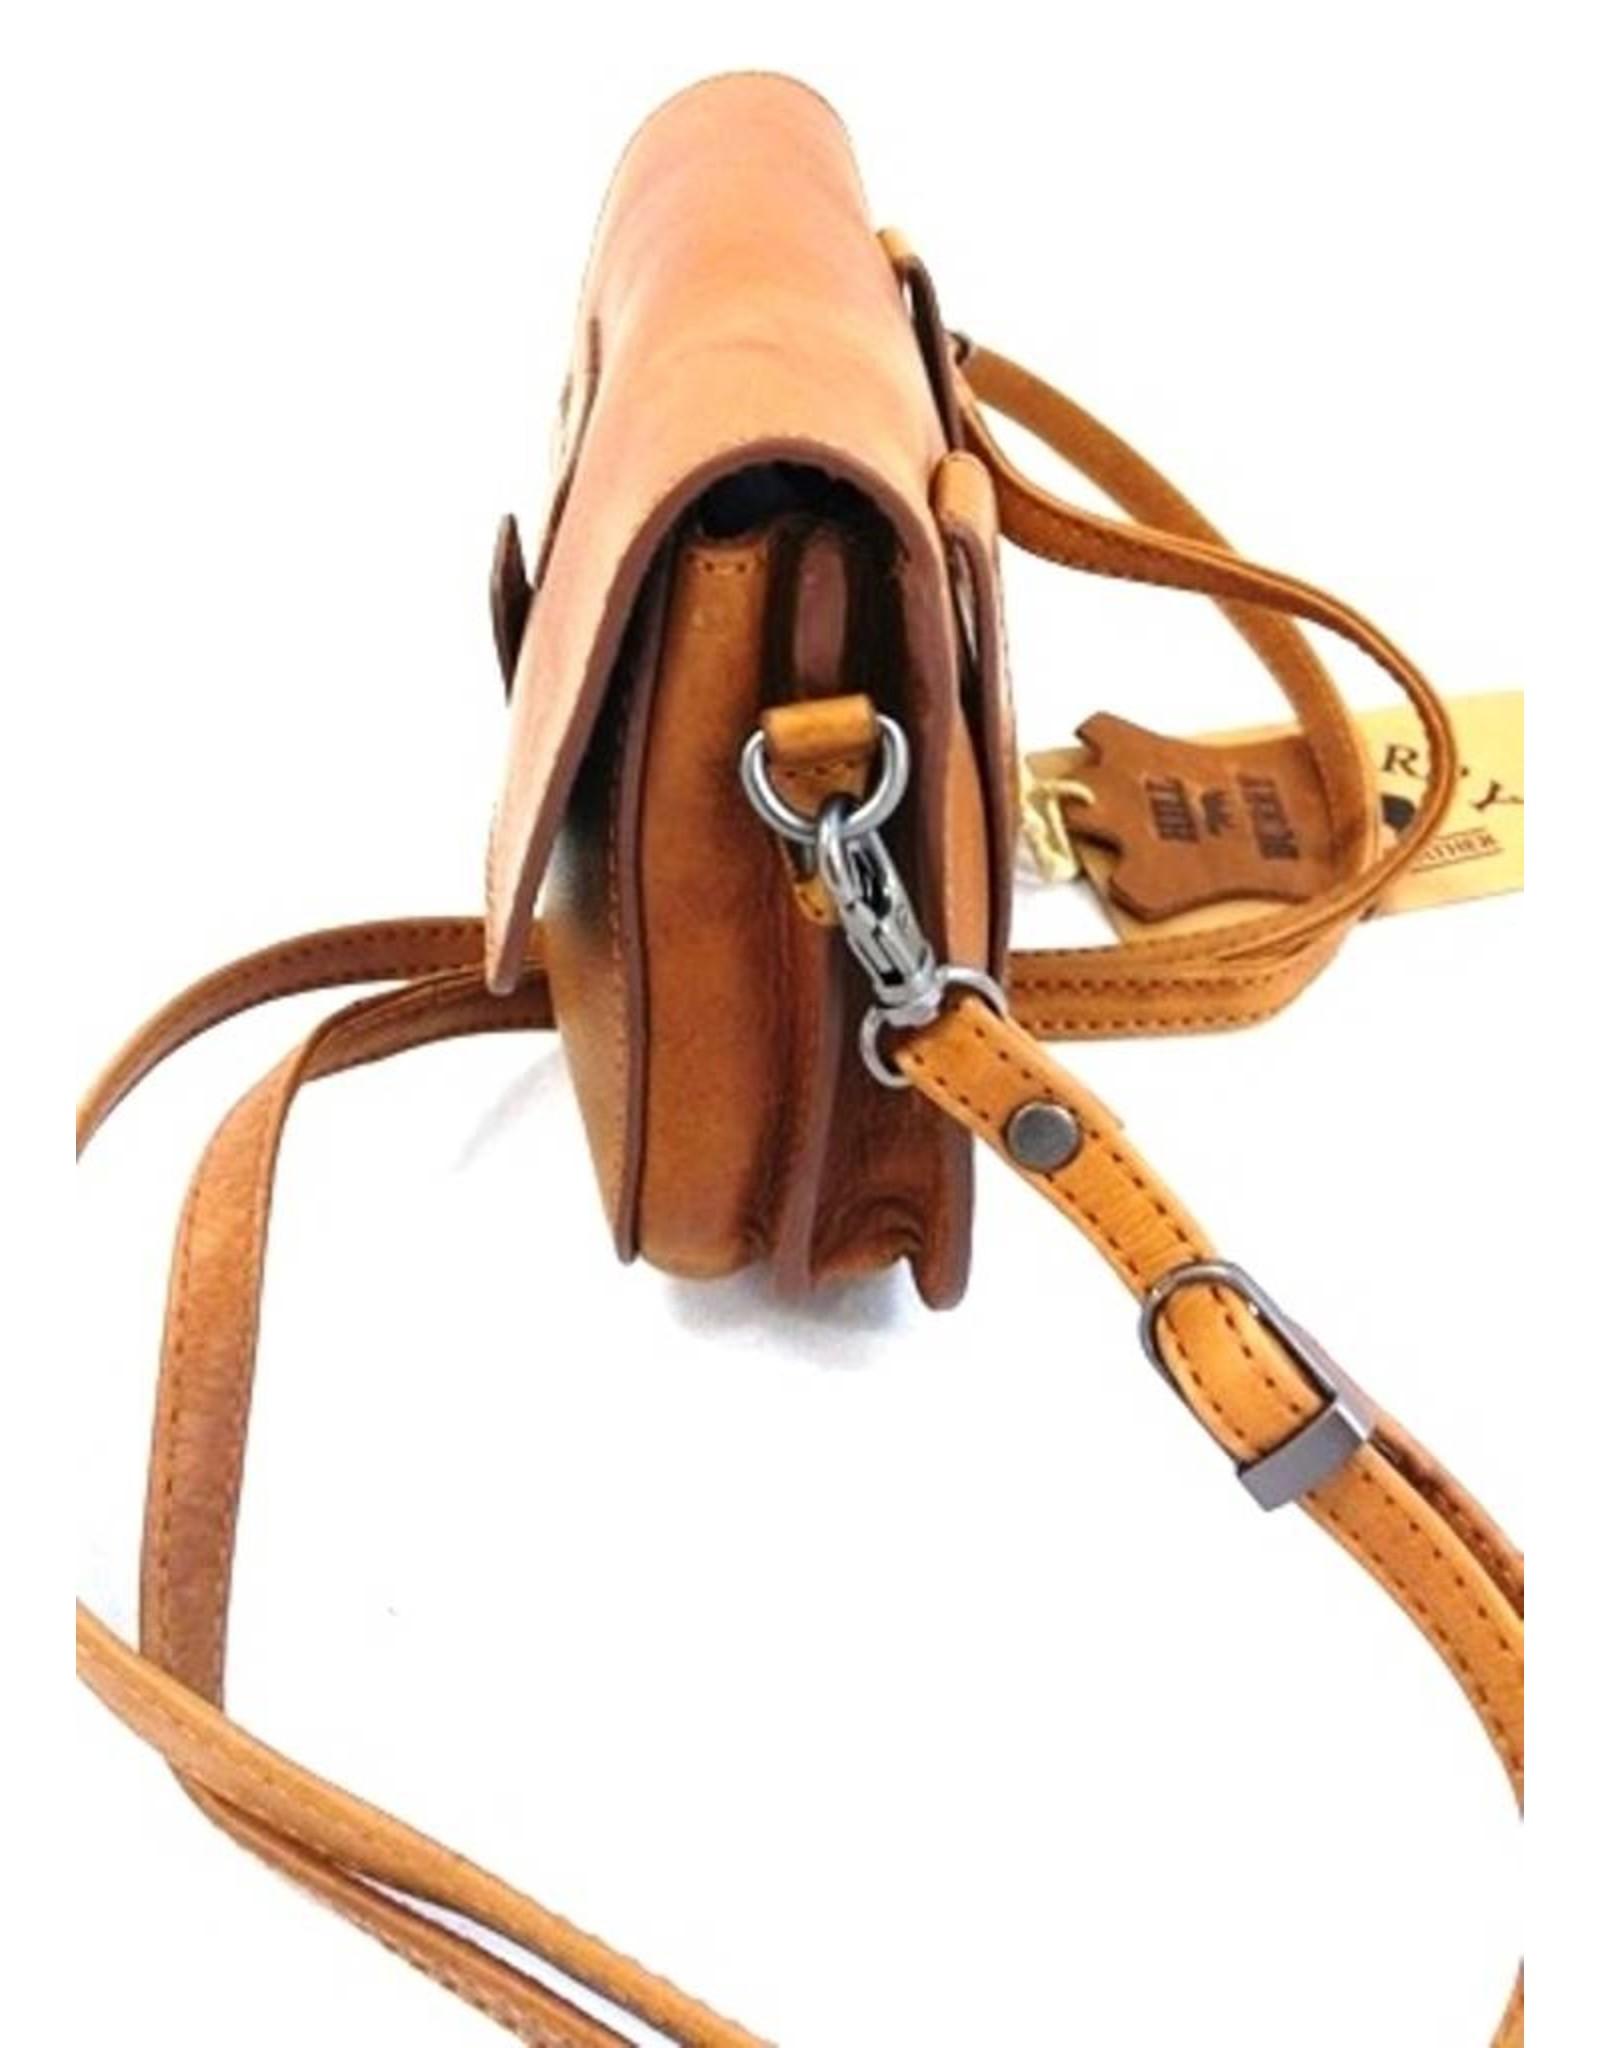 HillBurry Leather bags - HillBurry Leather Shoulder bag 3279cg